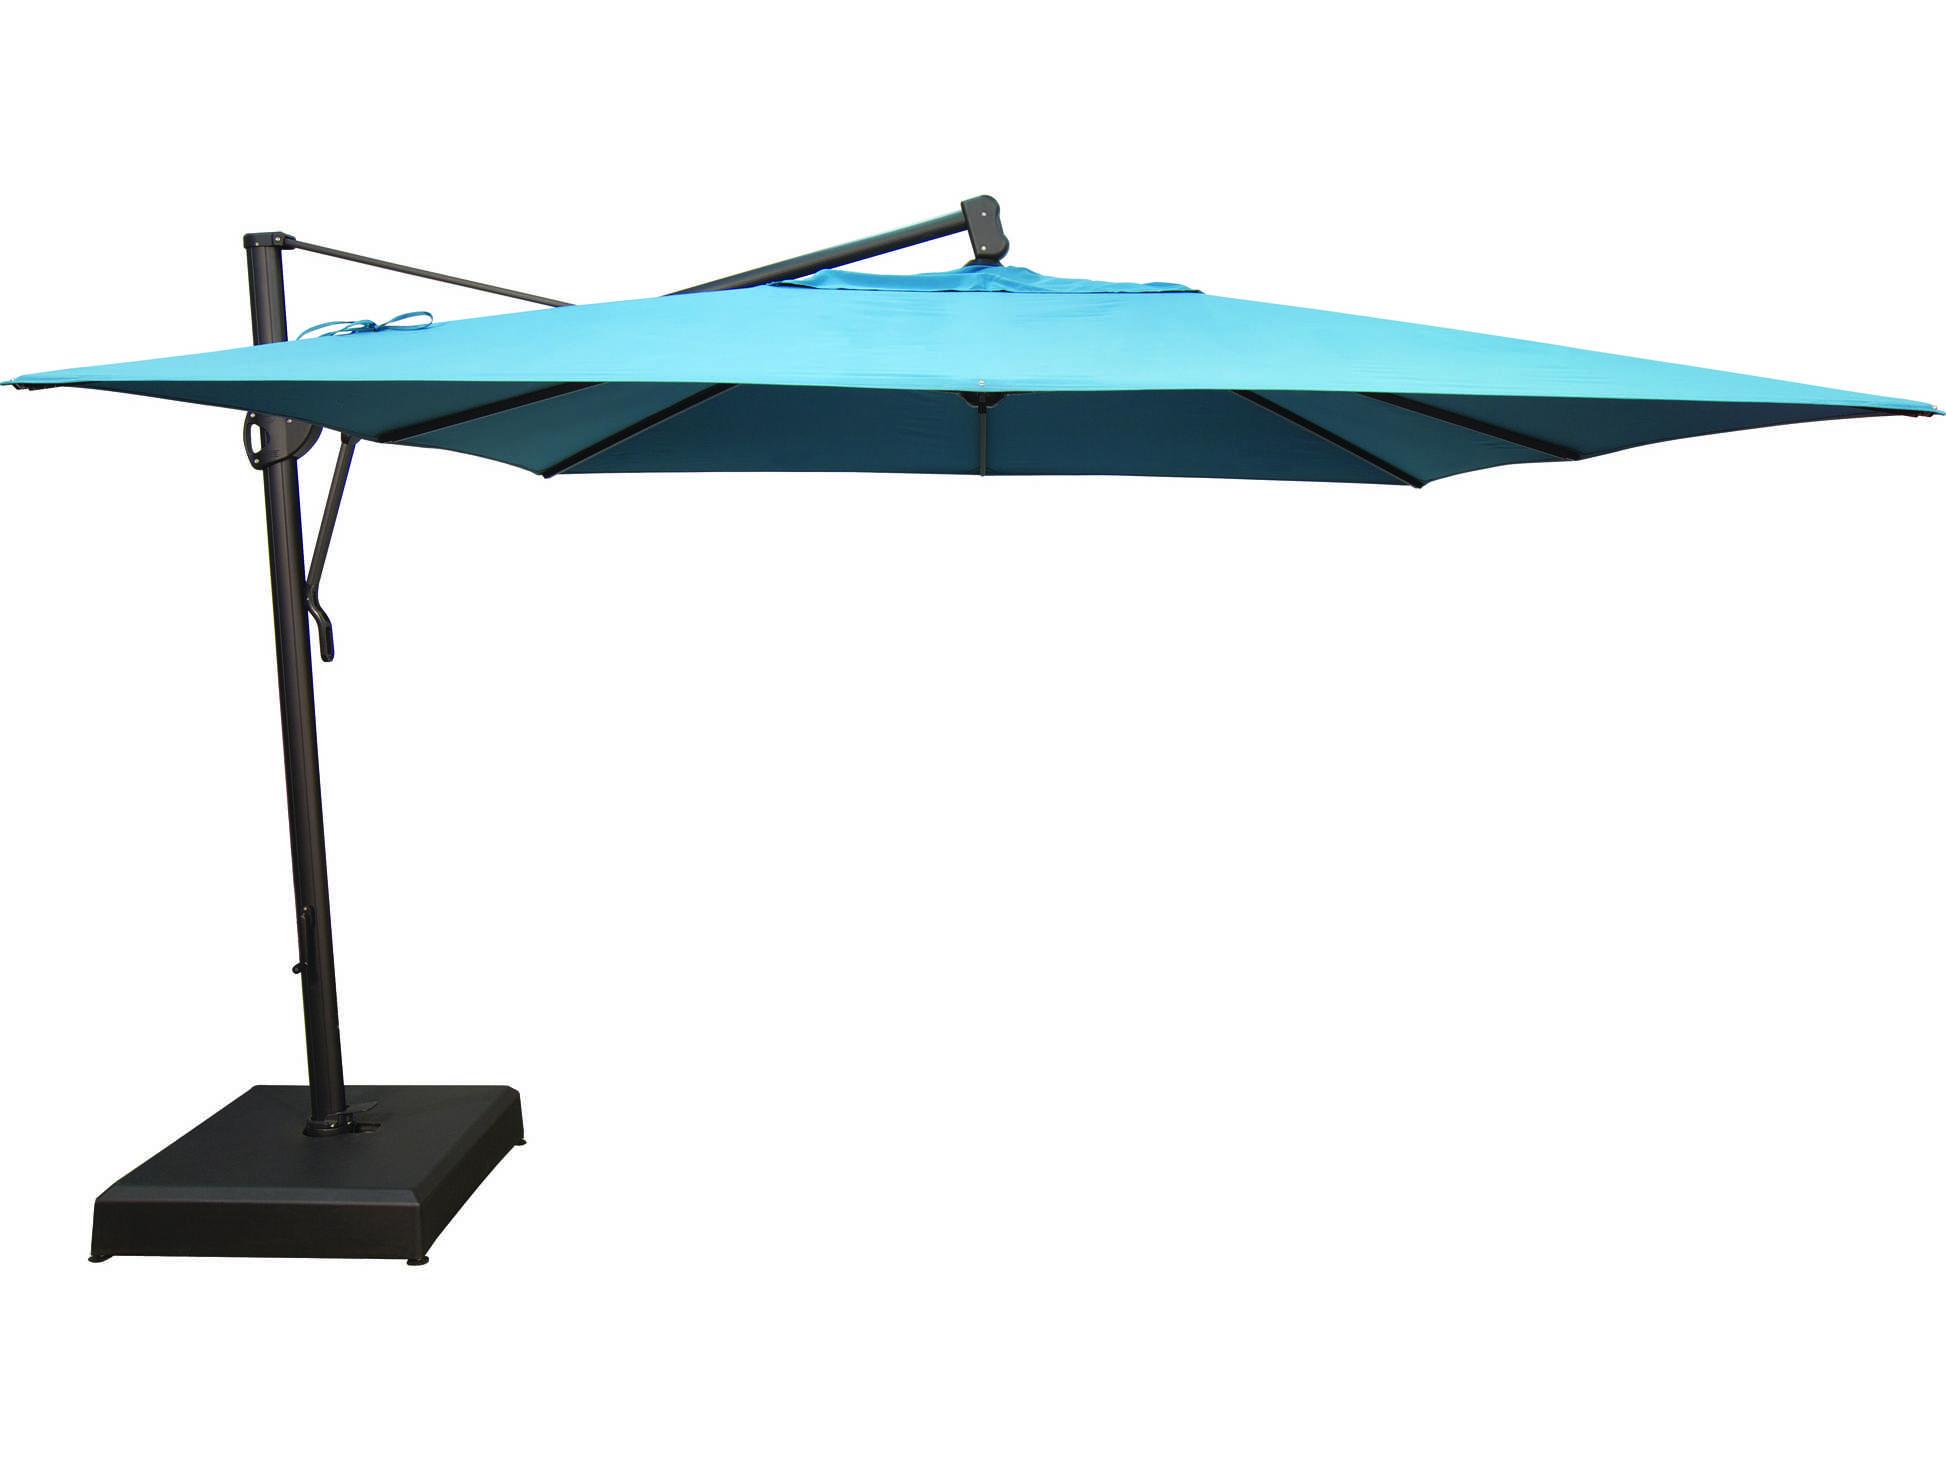 Treasure garden cantilever aluminum 115 foot wide for Garden treasures patio umbrella cover